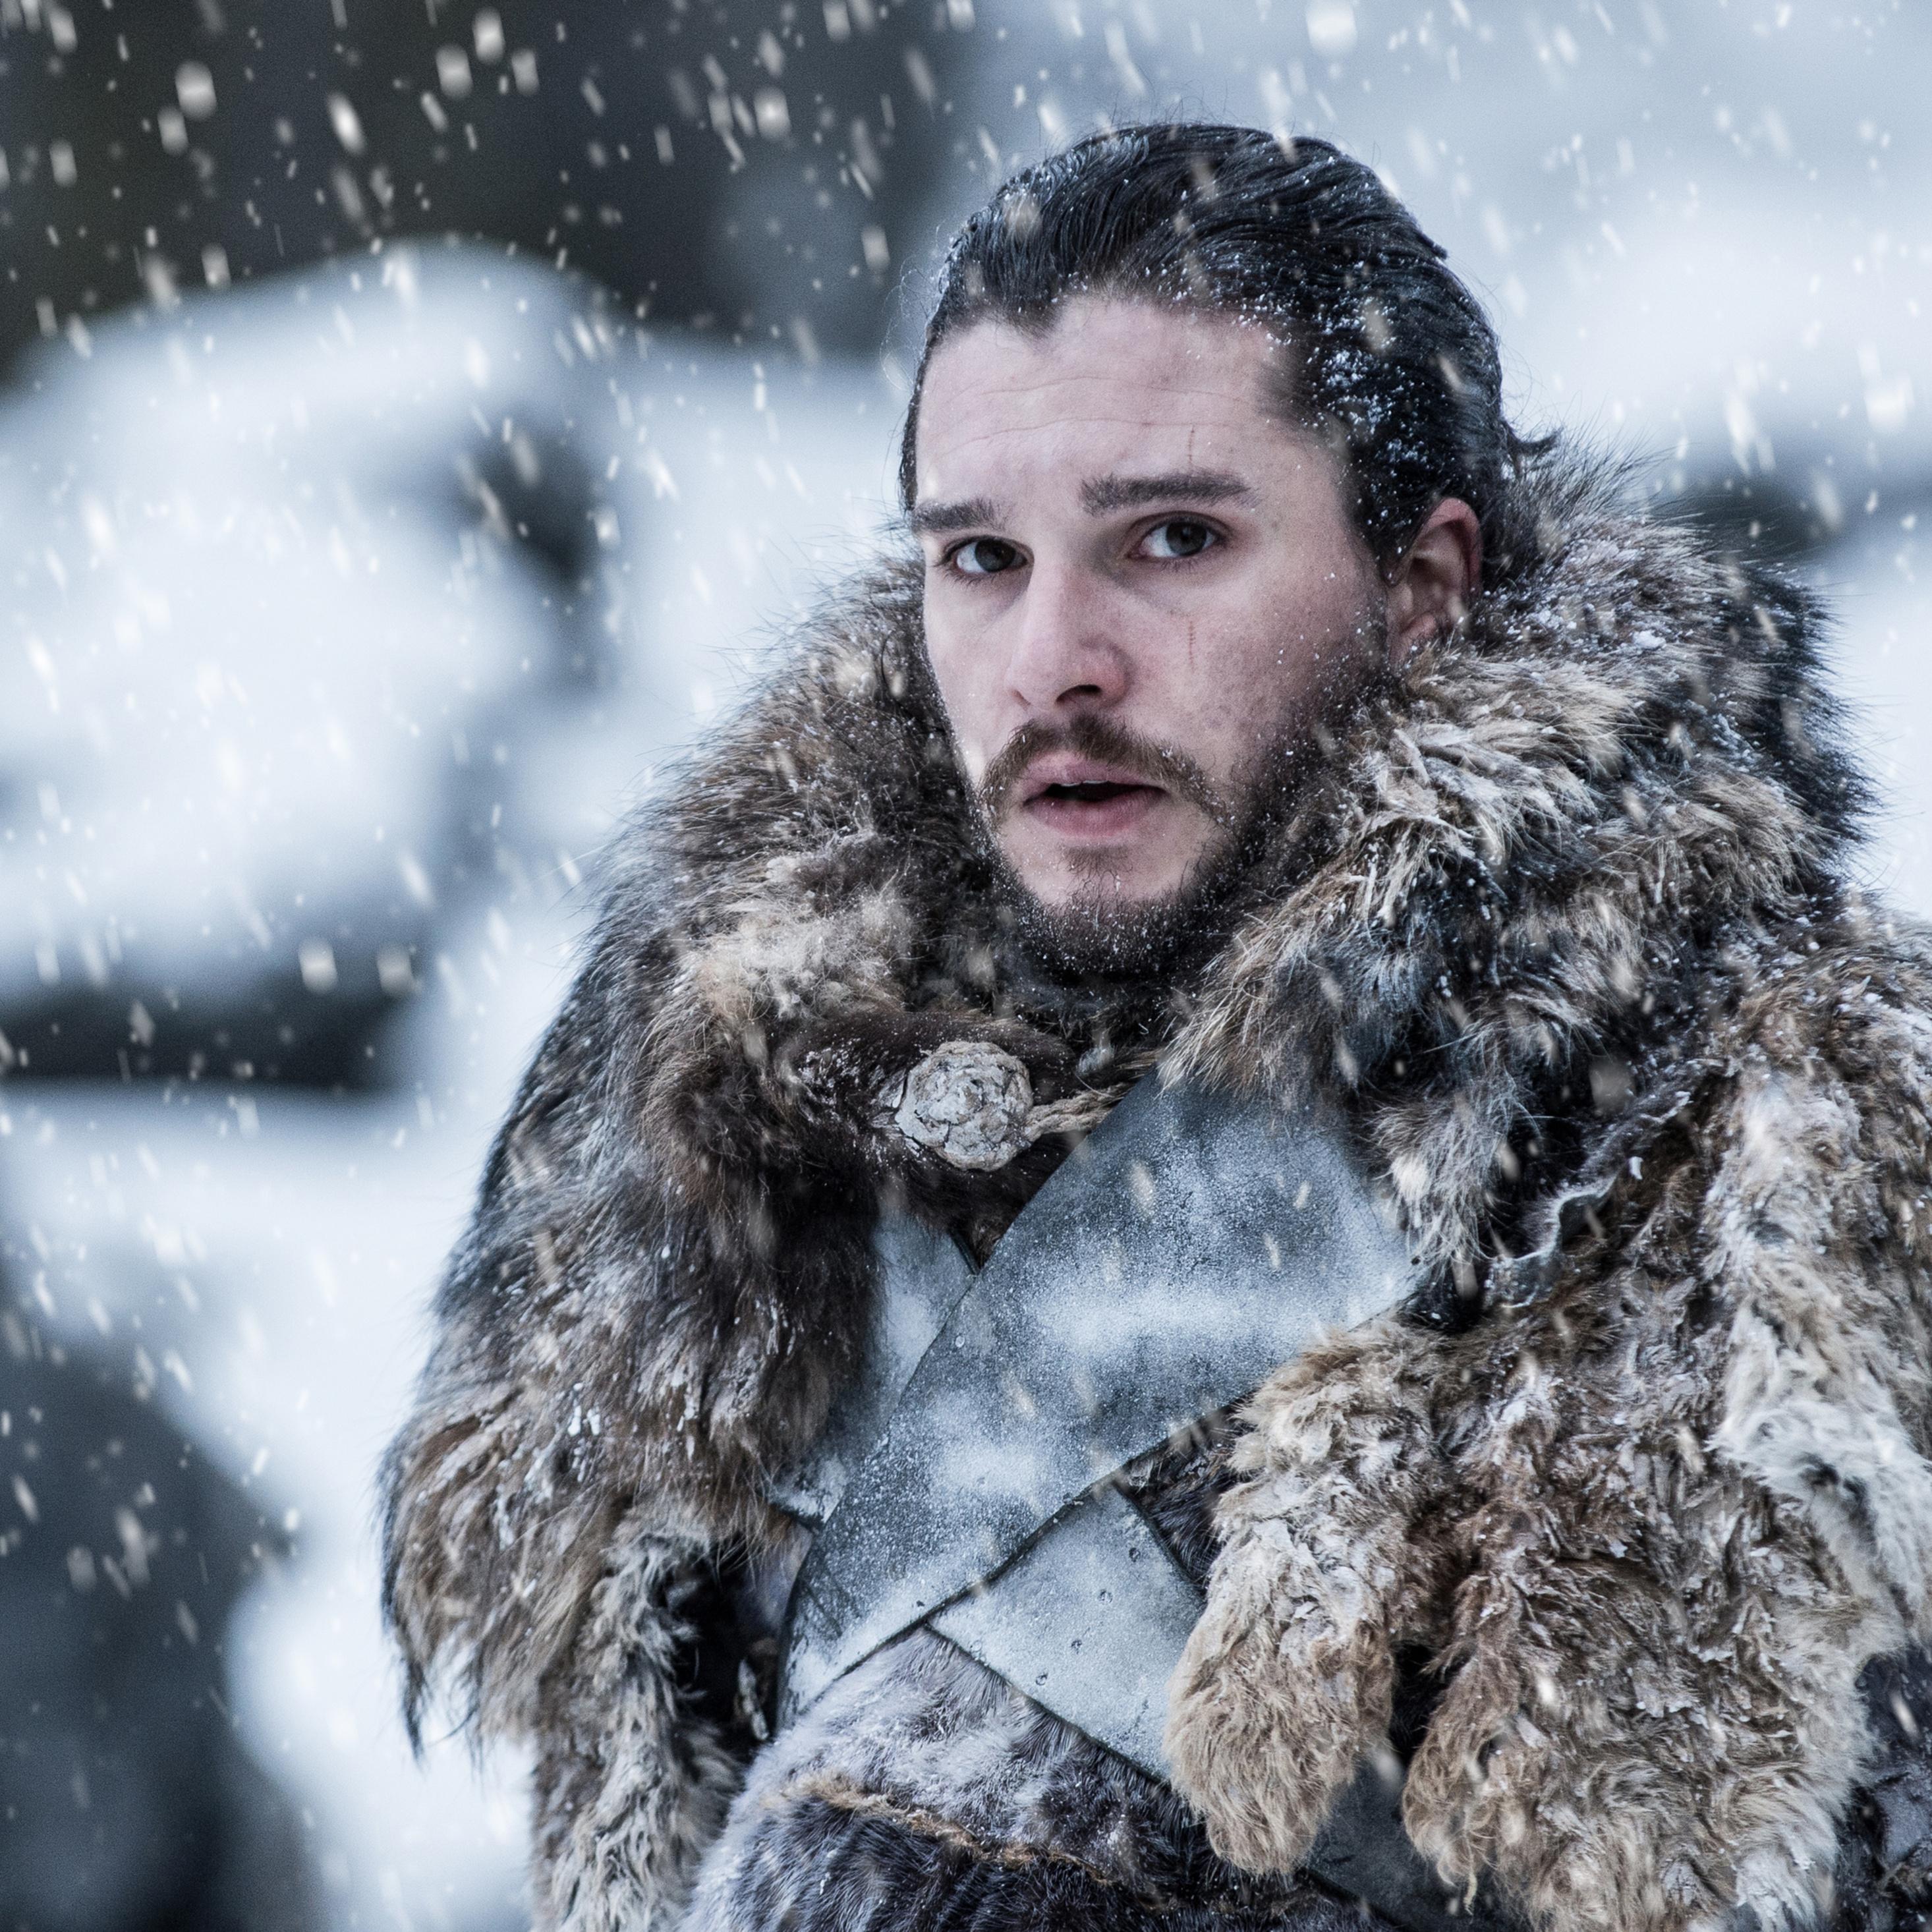 2932x2932 Jon Snow Beyond The Wall Game Of Thrones 4k Ipad Pro